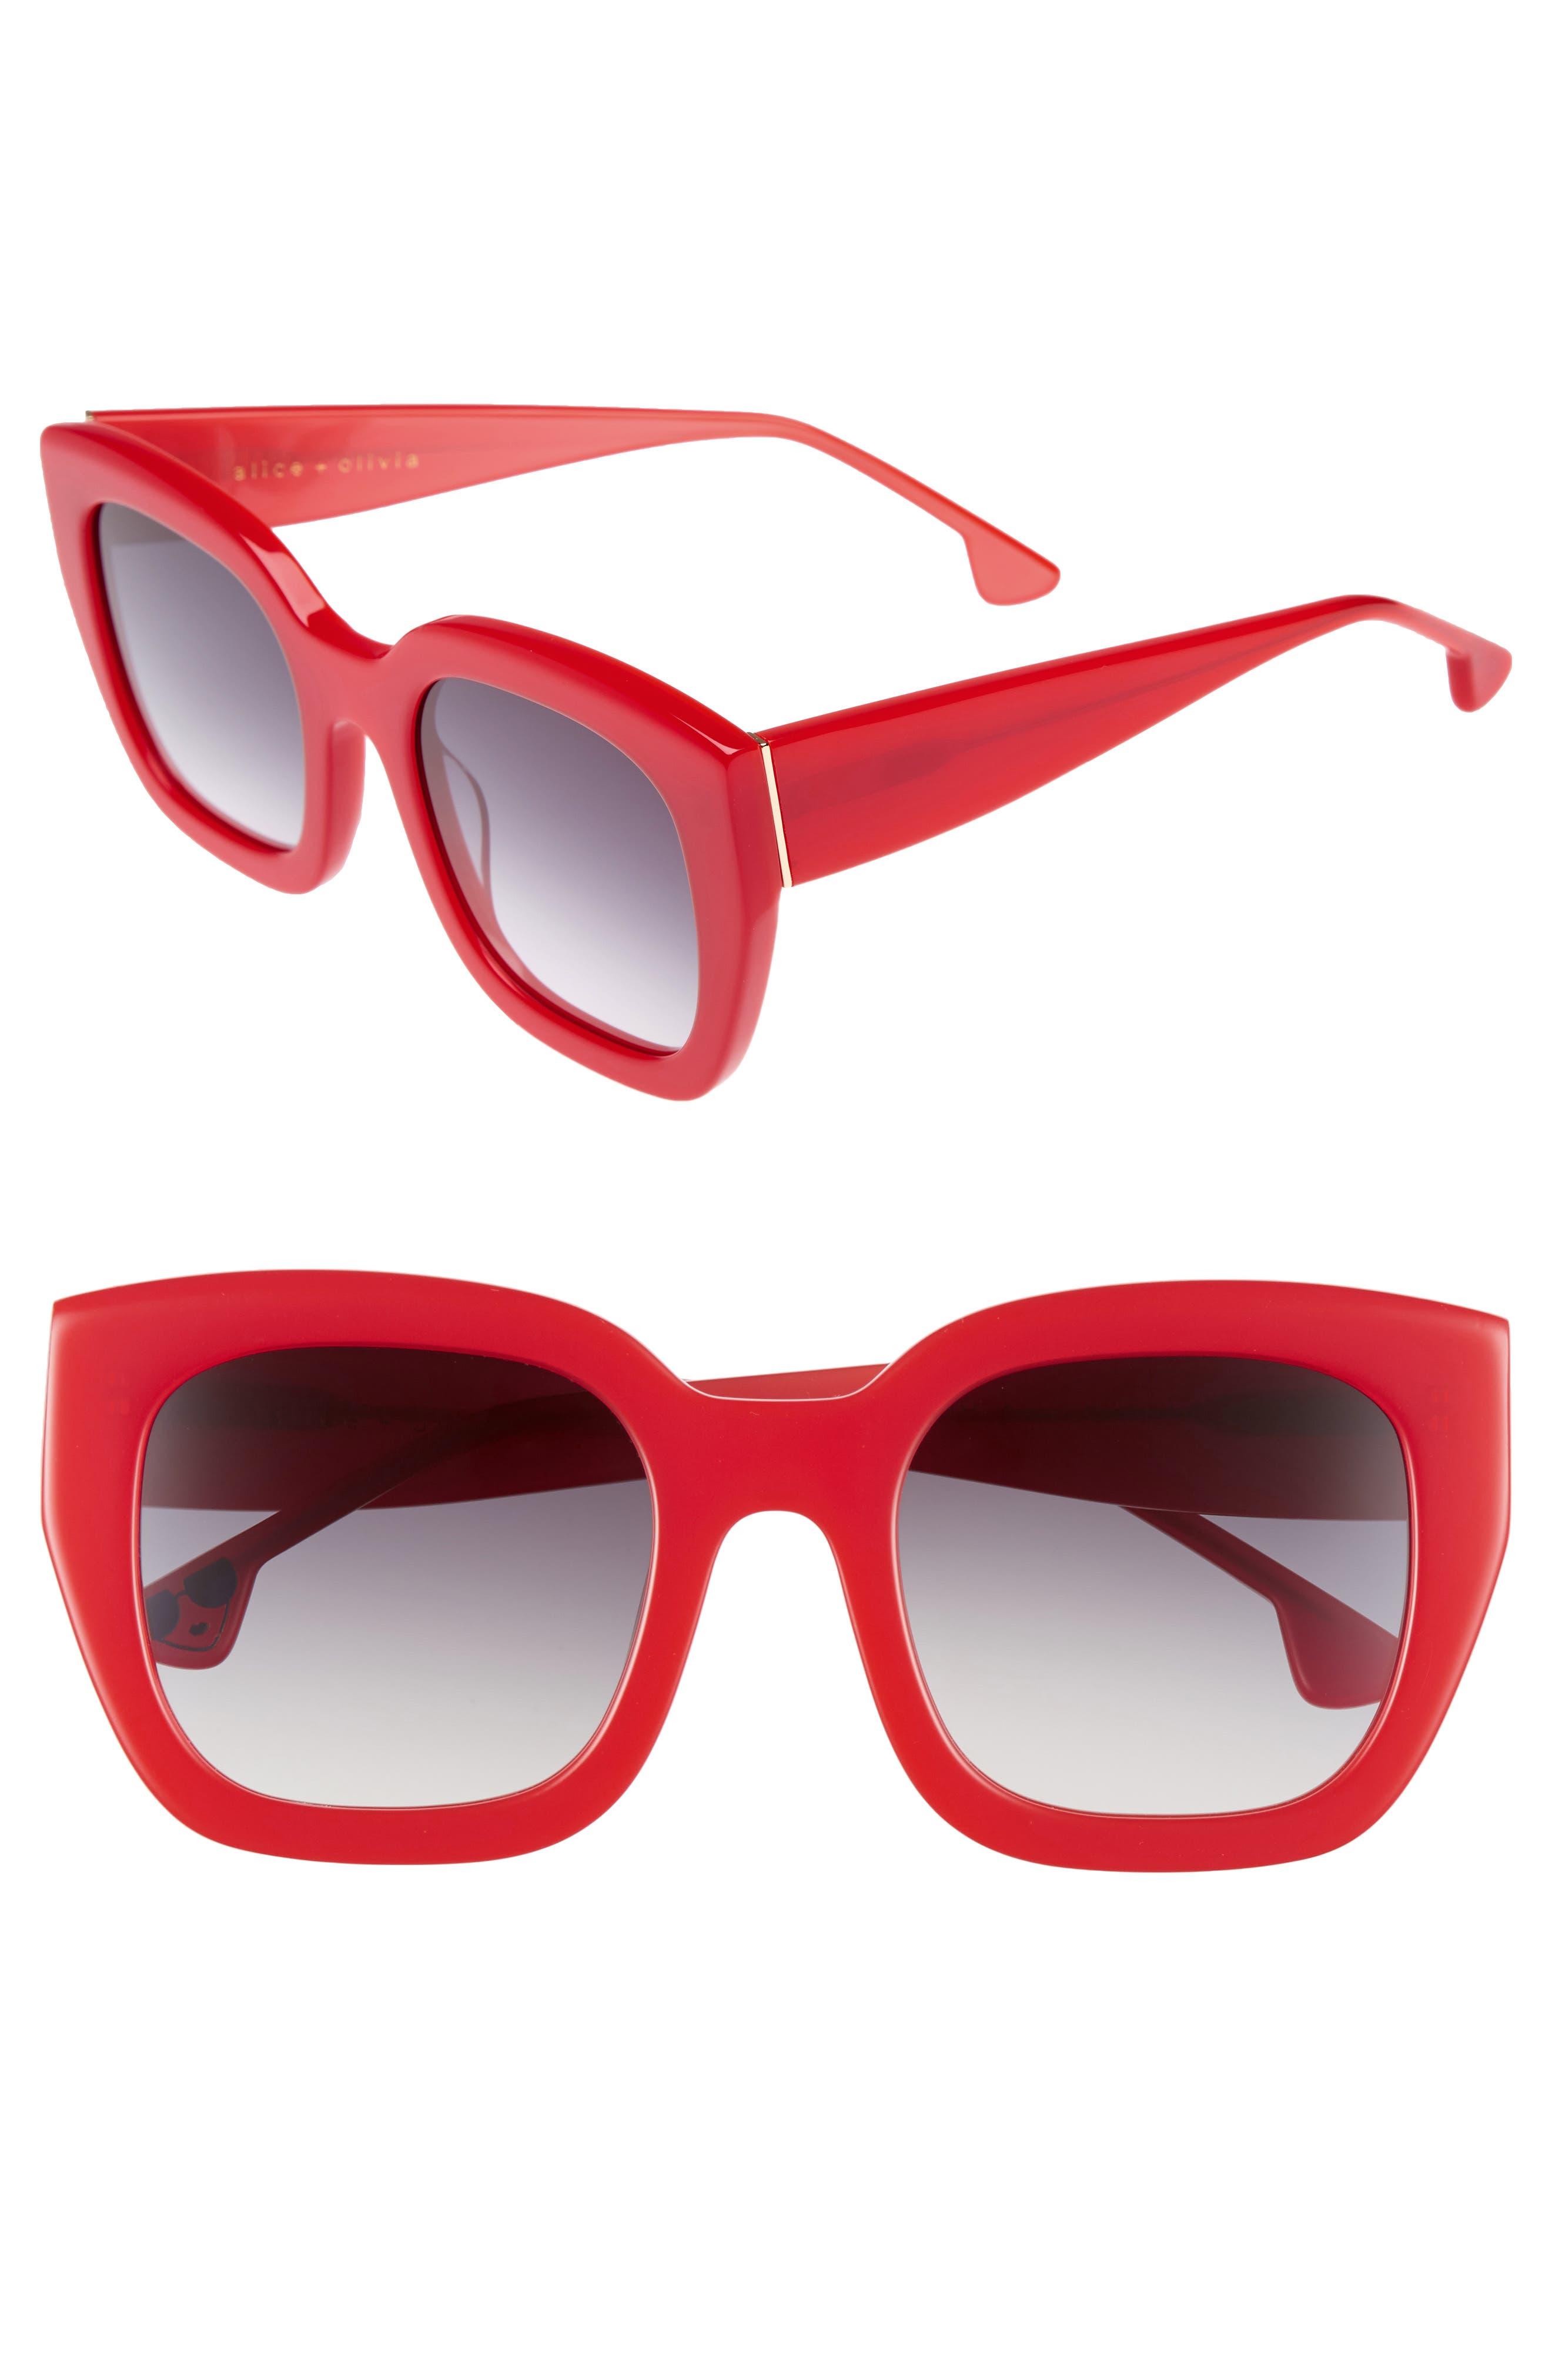 Main Image - Alice + Olivia Aberdeen 50mm Square Sunglasses